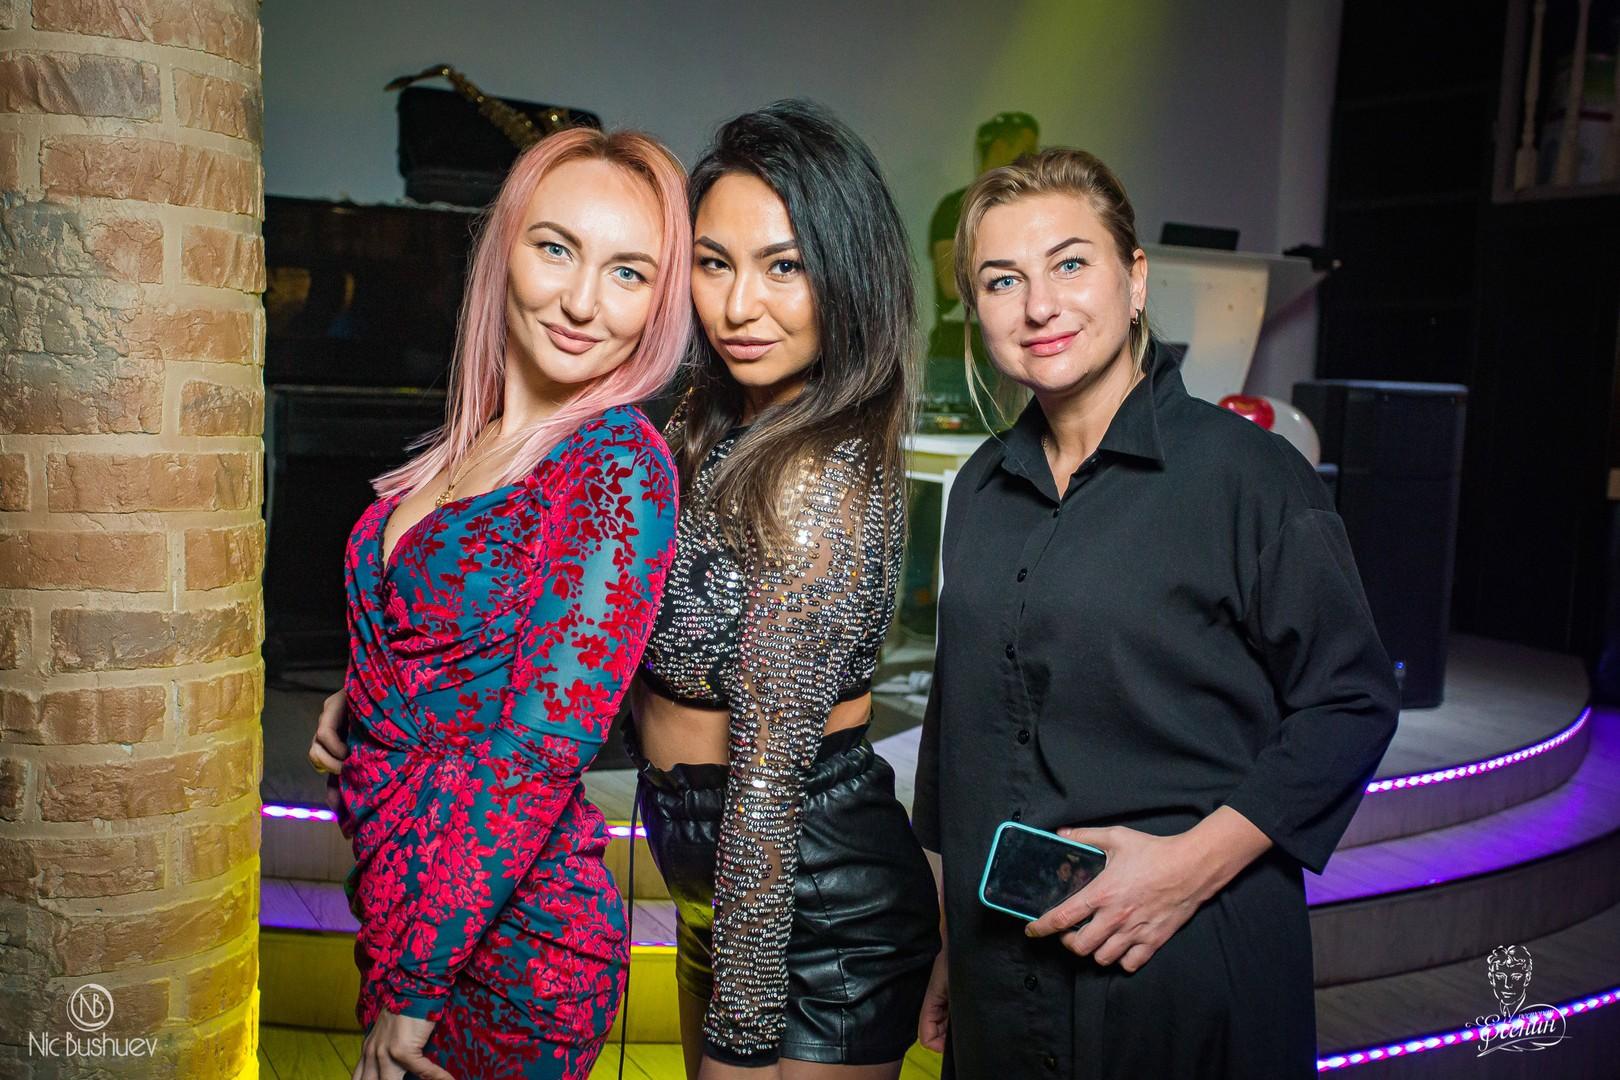 Ресторан Орехово-Зуево Есенин 14_02_2020 (40)